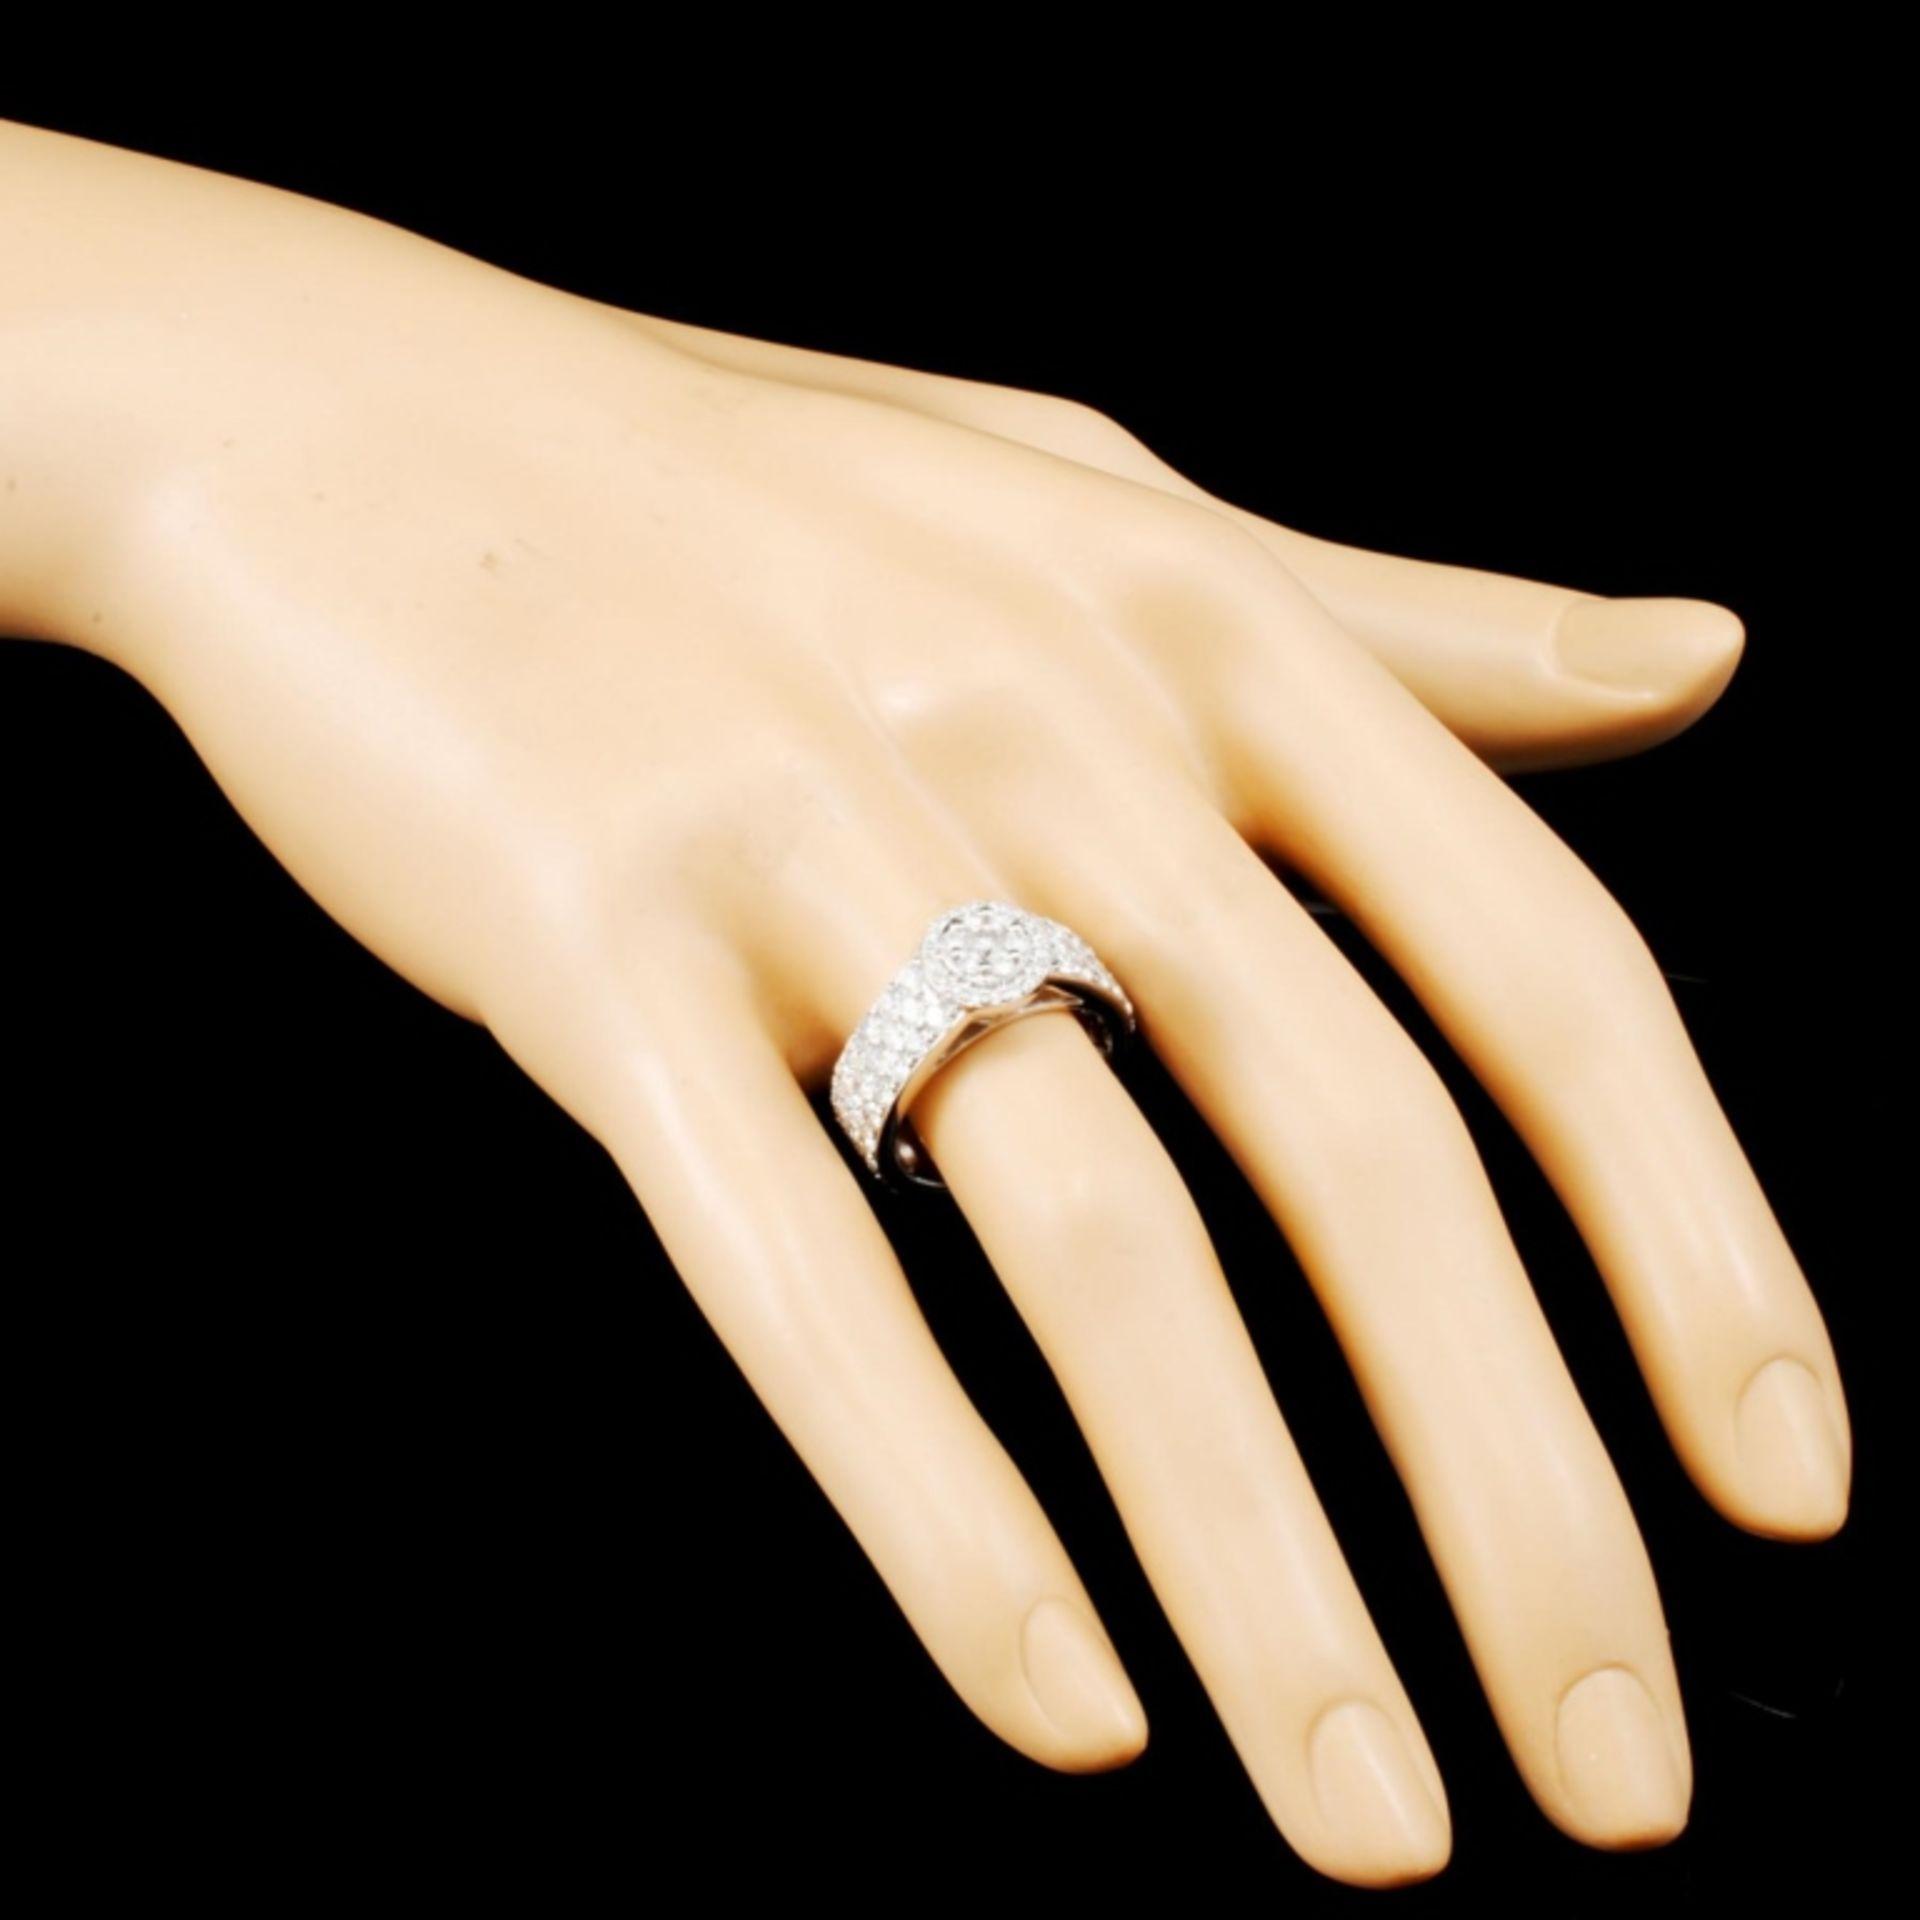 14K Gold 2.39ctw Diamond Ring - Image 3 of 5